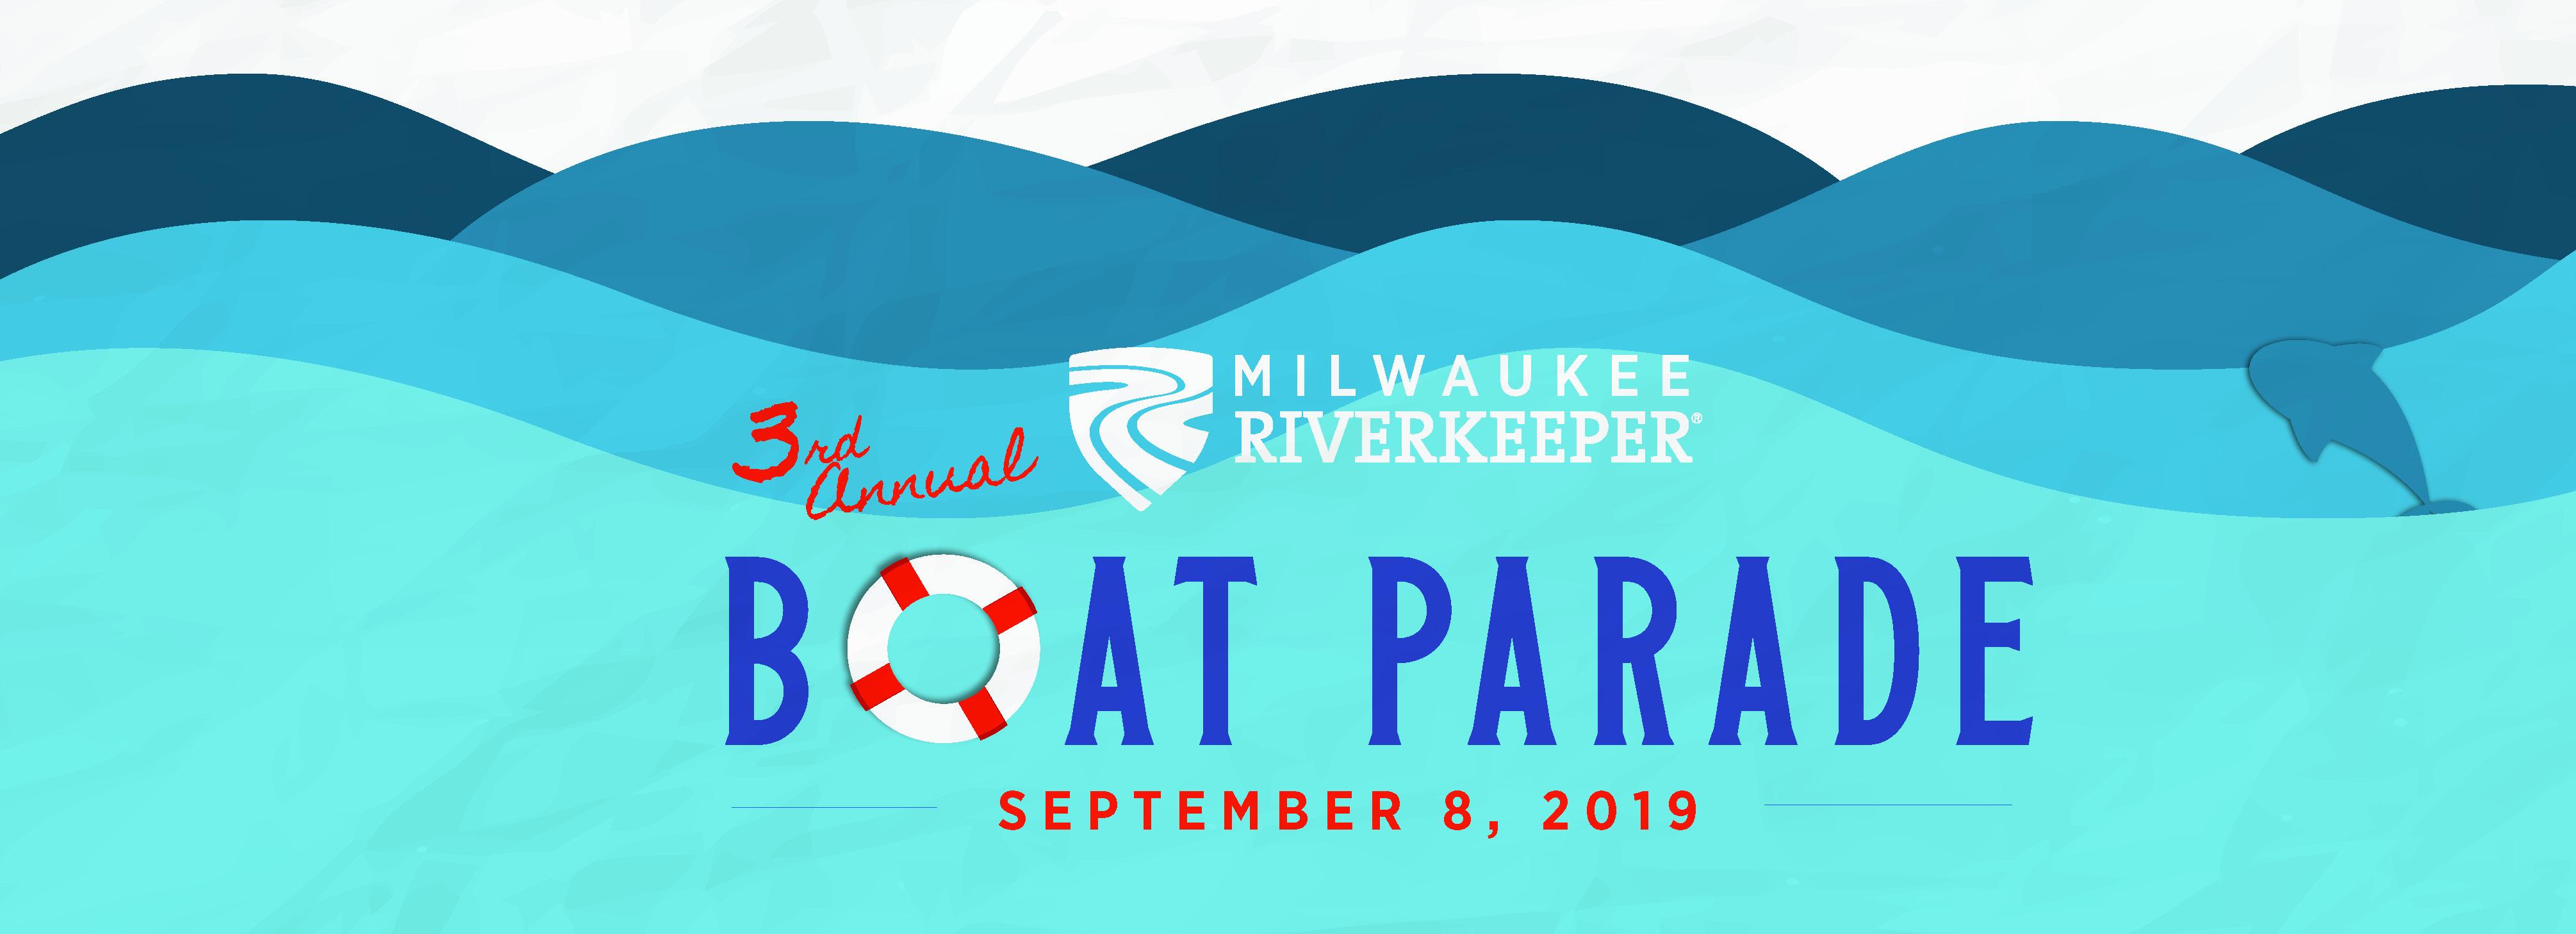 Milwaukee Riverkeeper Boat Parade - Milwaukee Riverkeeper